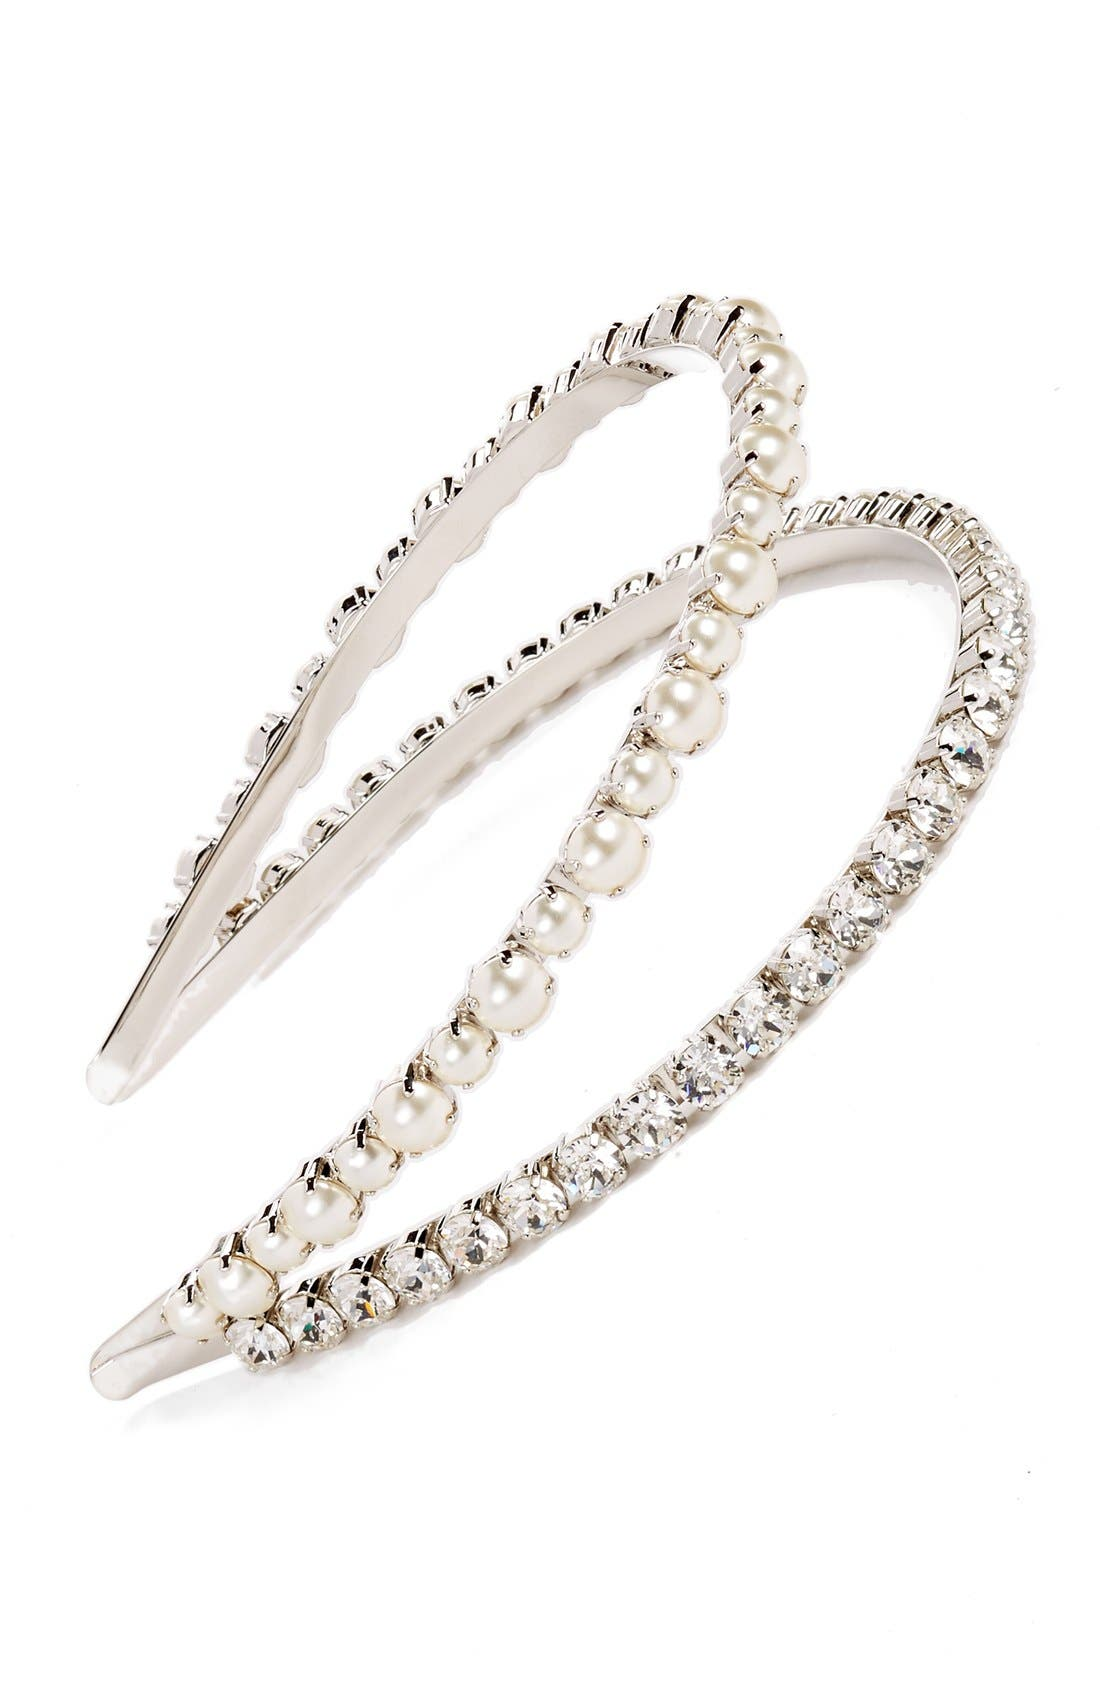 'Classic' Bead & Crystal Double Headband,                             Main thumbnail 1, color,                             CREAM/ CRISTAL